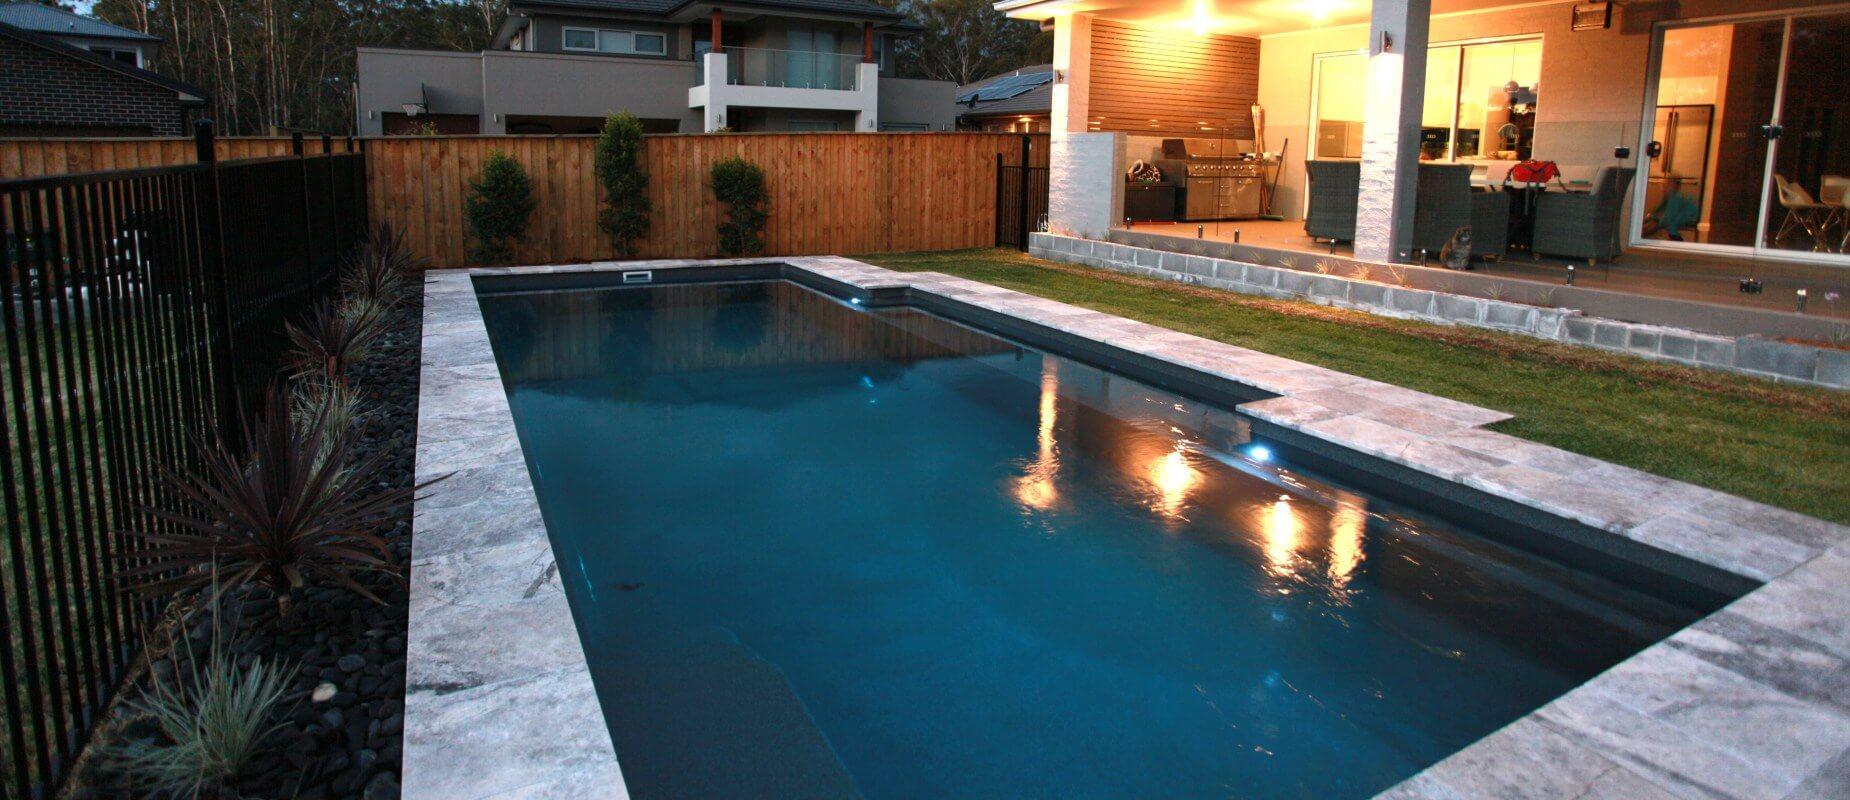 piscina de lux modele frumoase 18